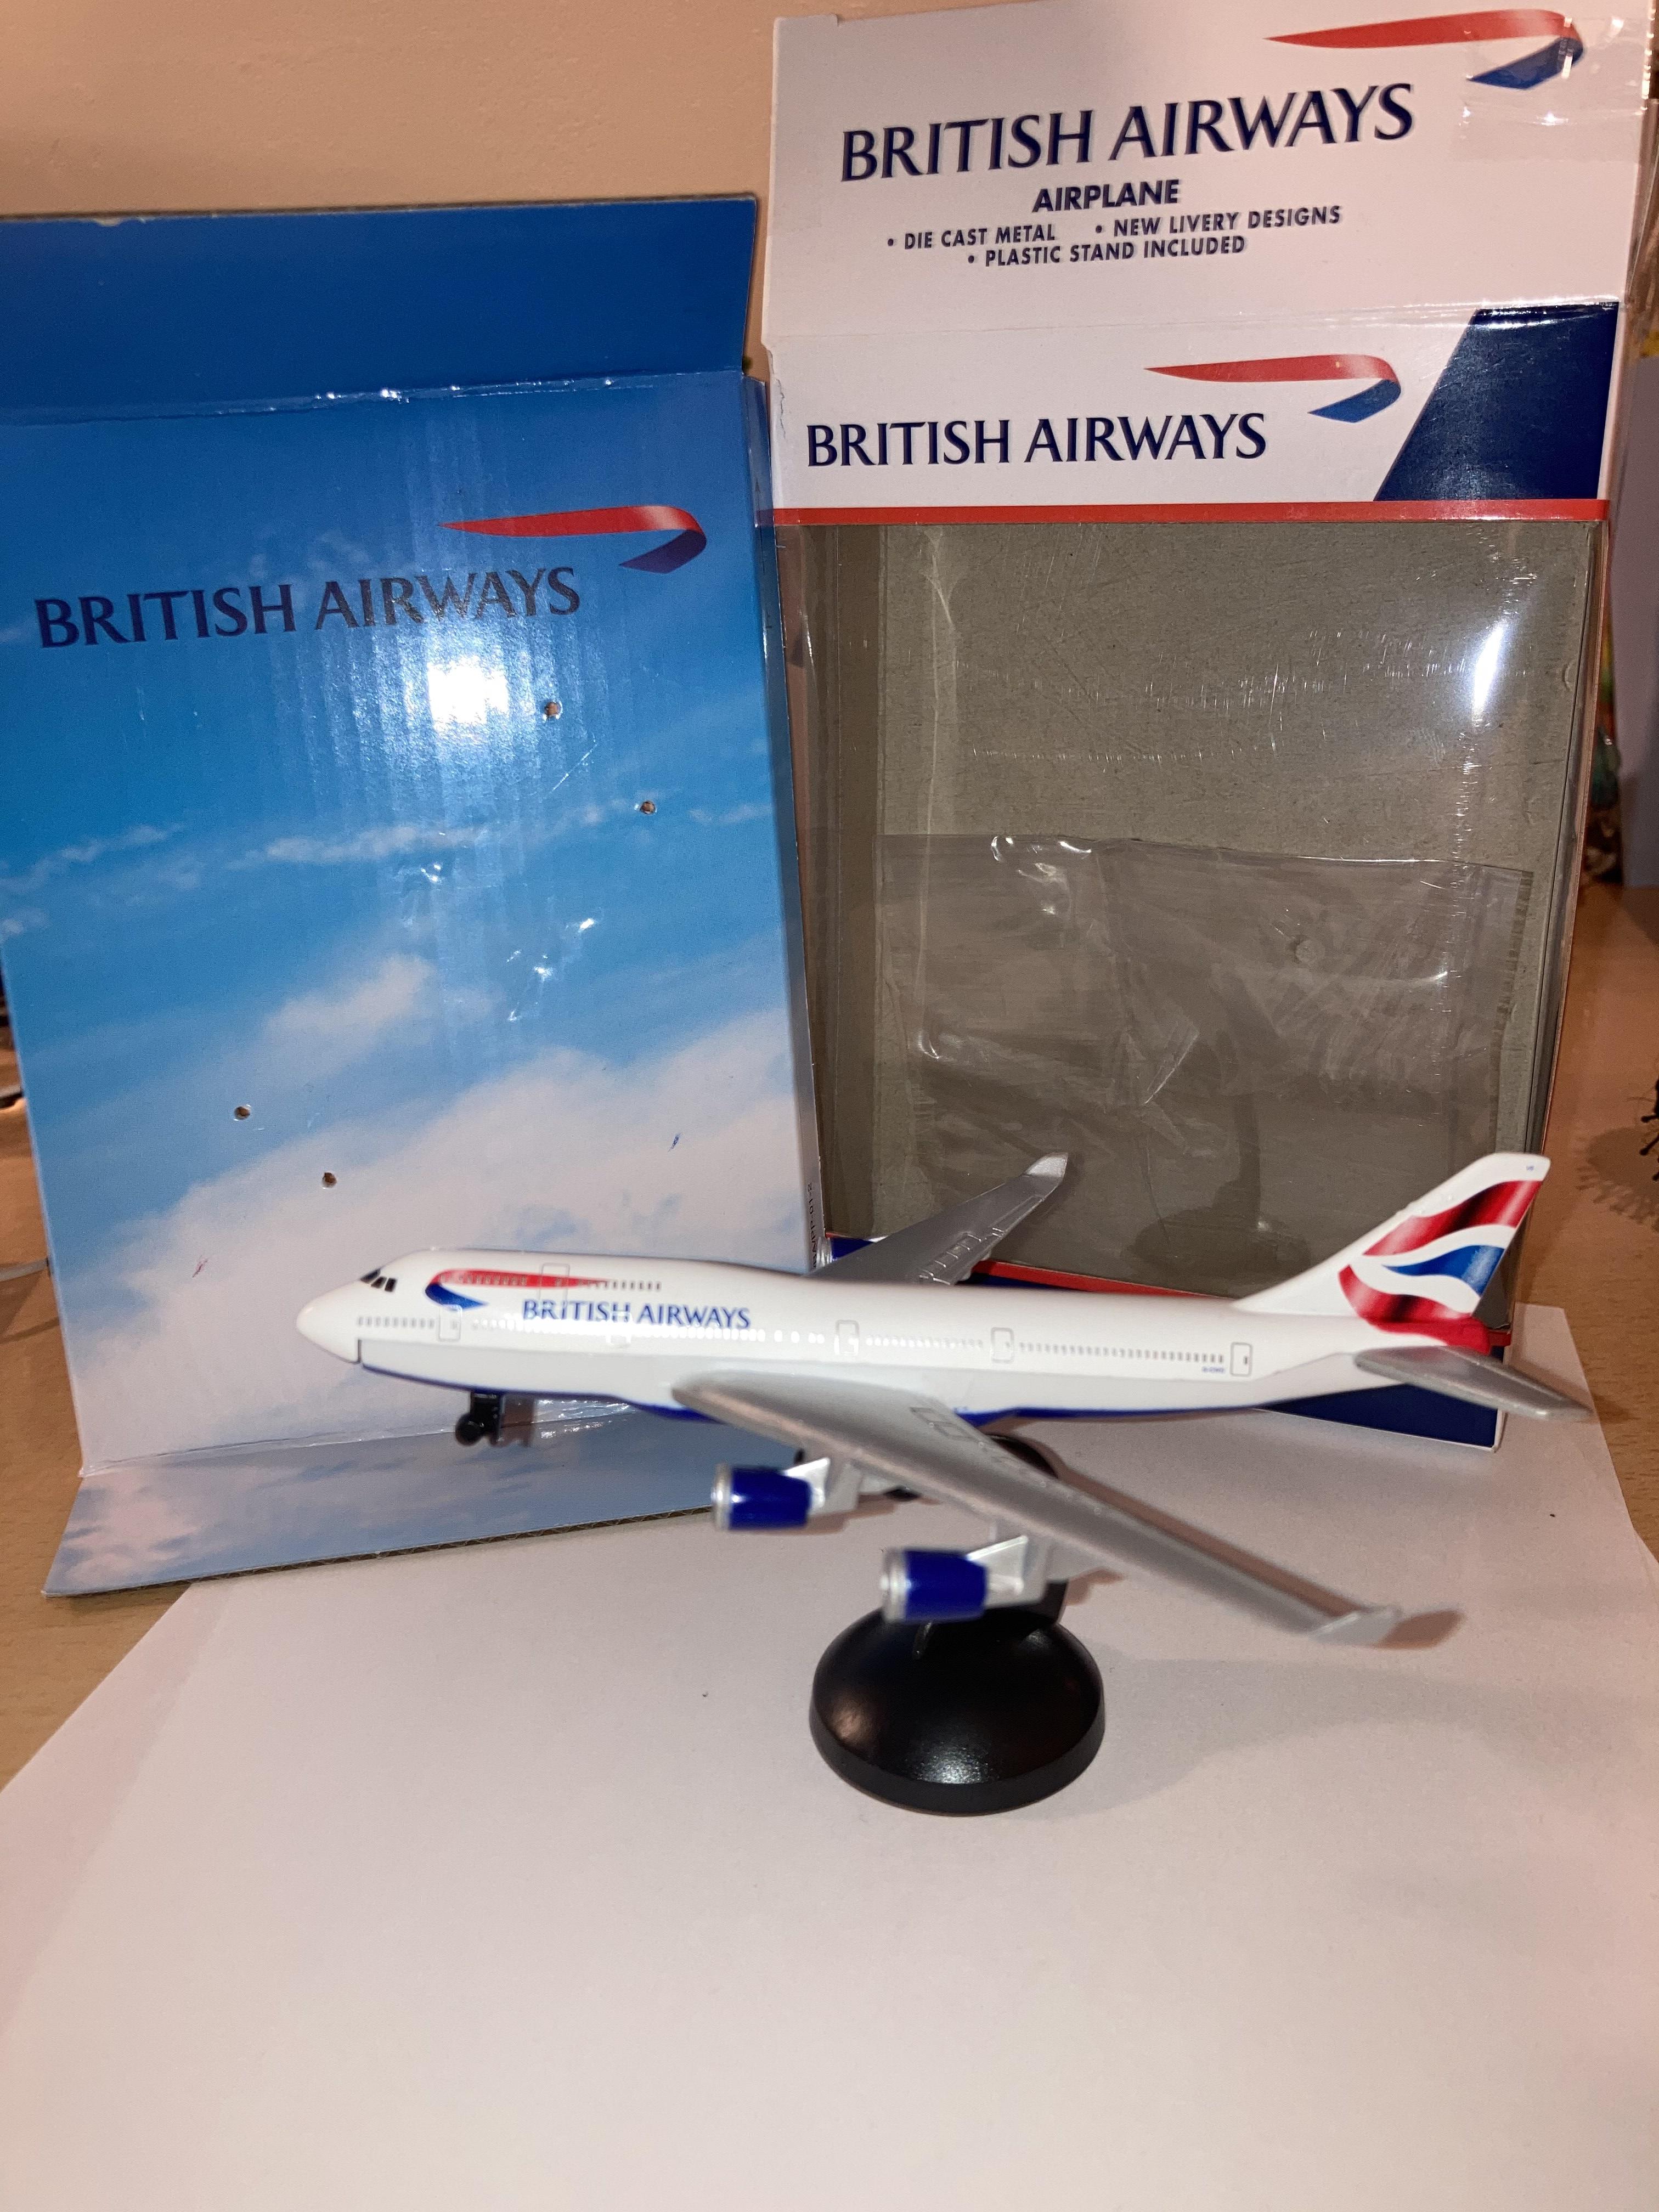 Die cast model Boeing 747 British Airways for £1.99 instore at Home Bargains